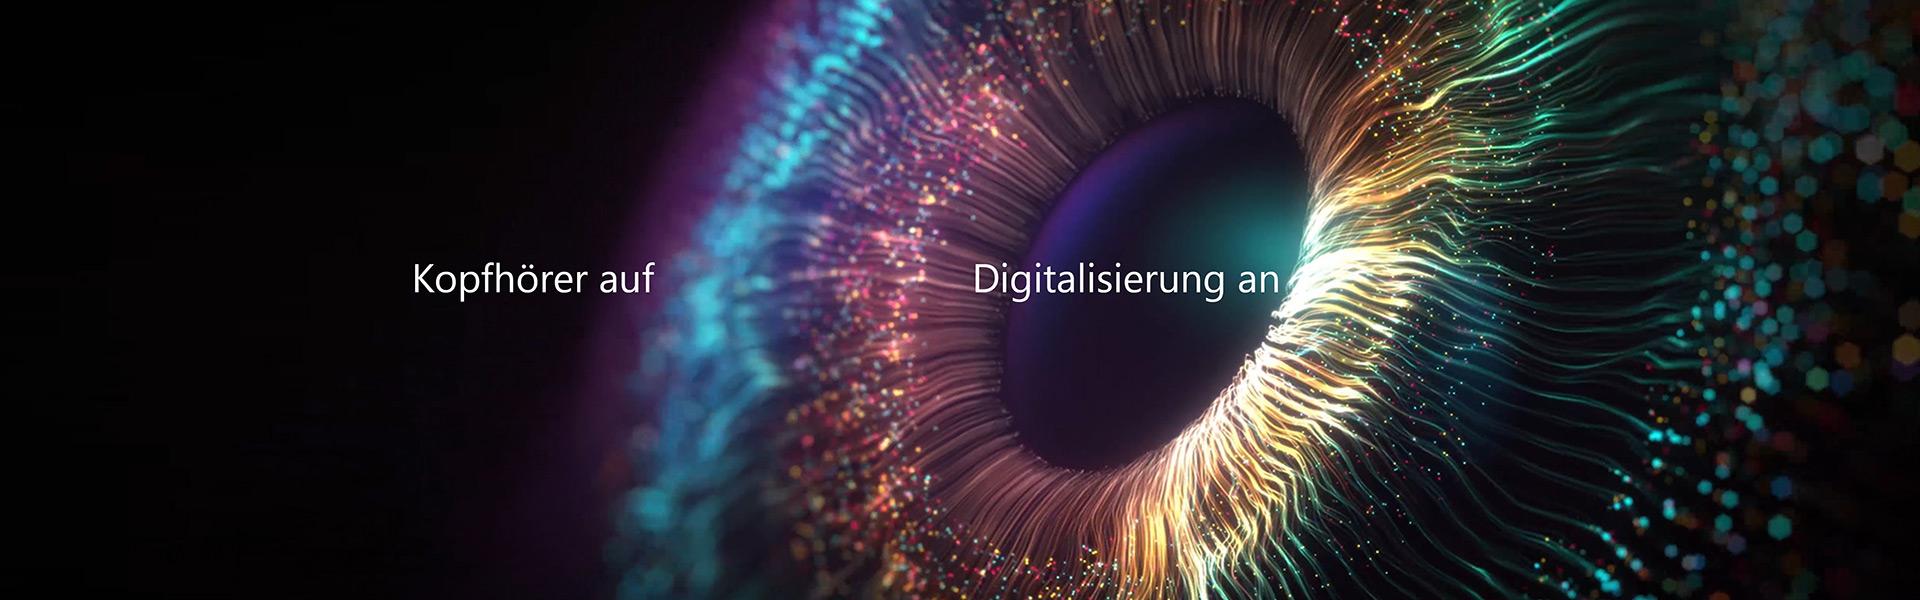 Köpfhörer auf Digitalisierung an